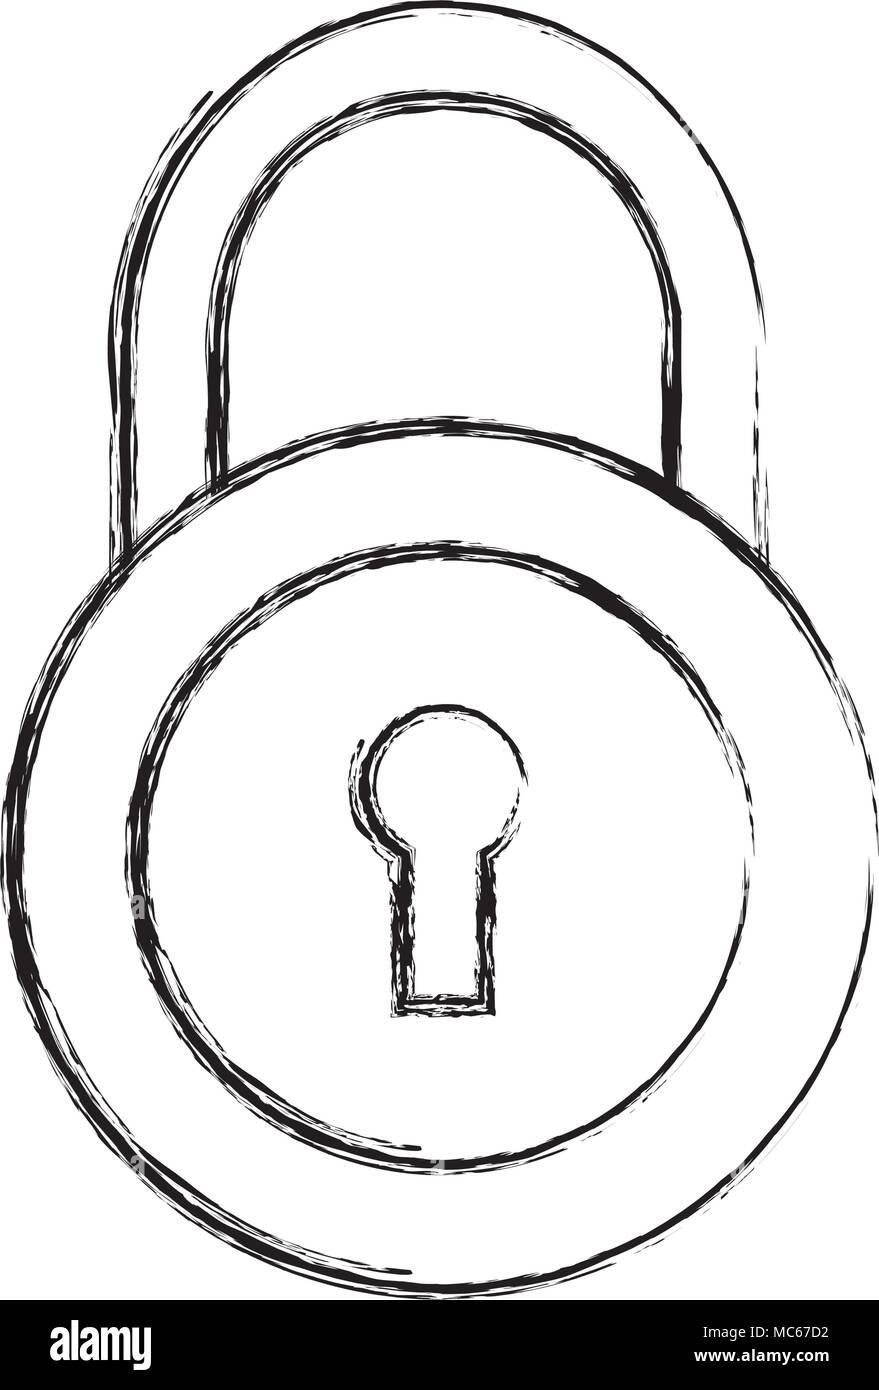 security padlock isolated icon - Stock Image